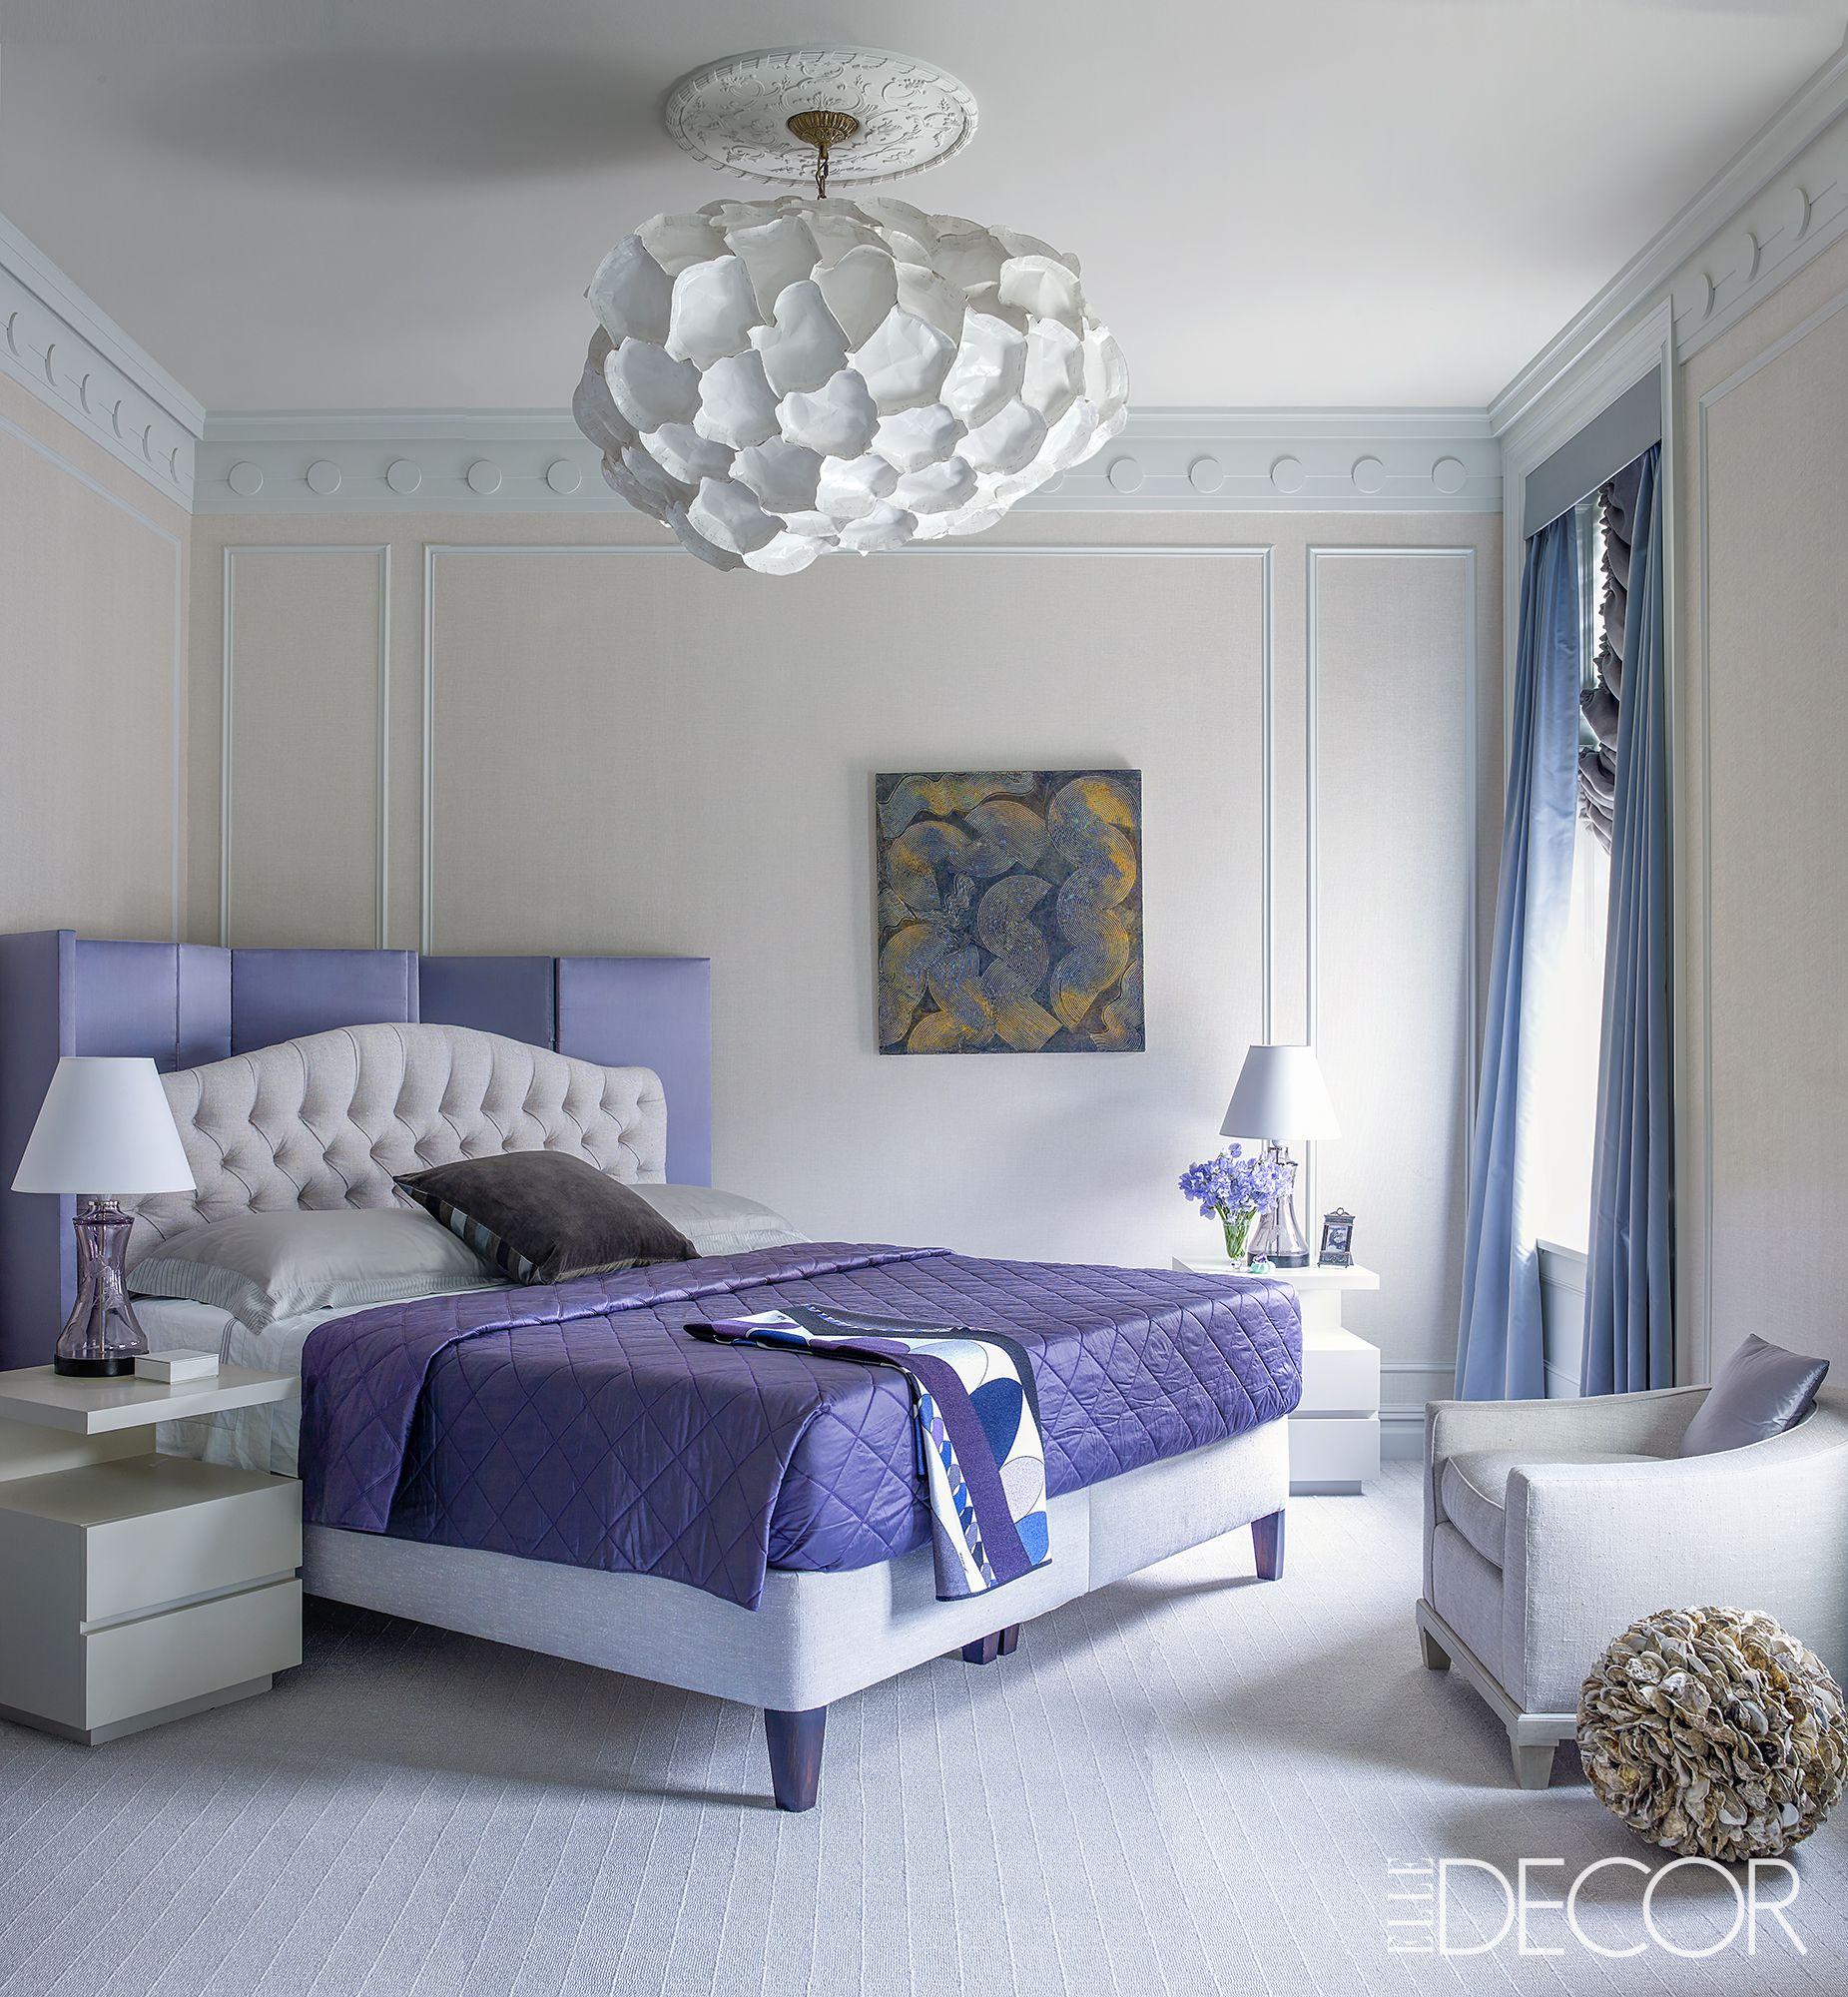 35 bedroom lighting ideas - best lights for bedrooms TPPYLQG